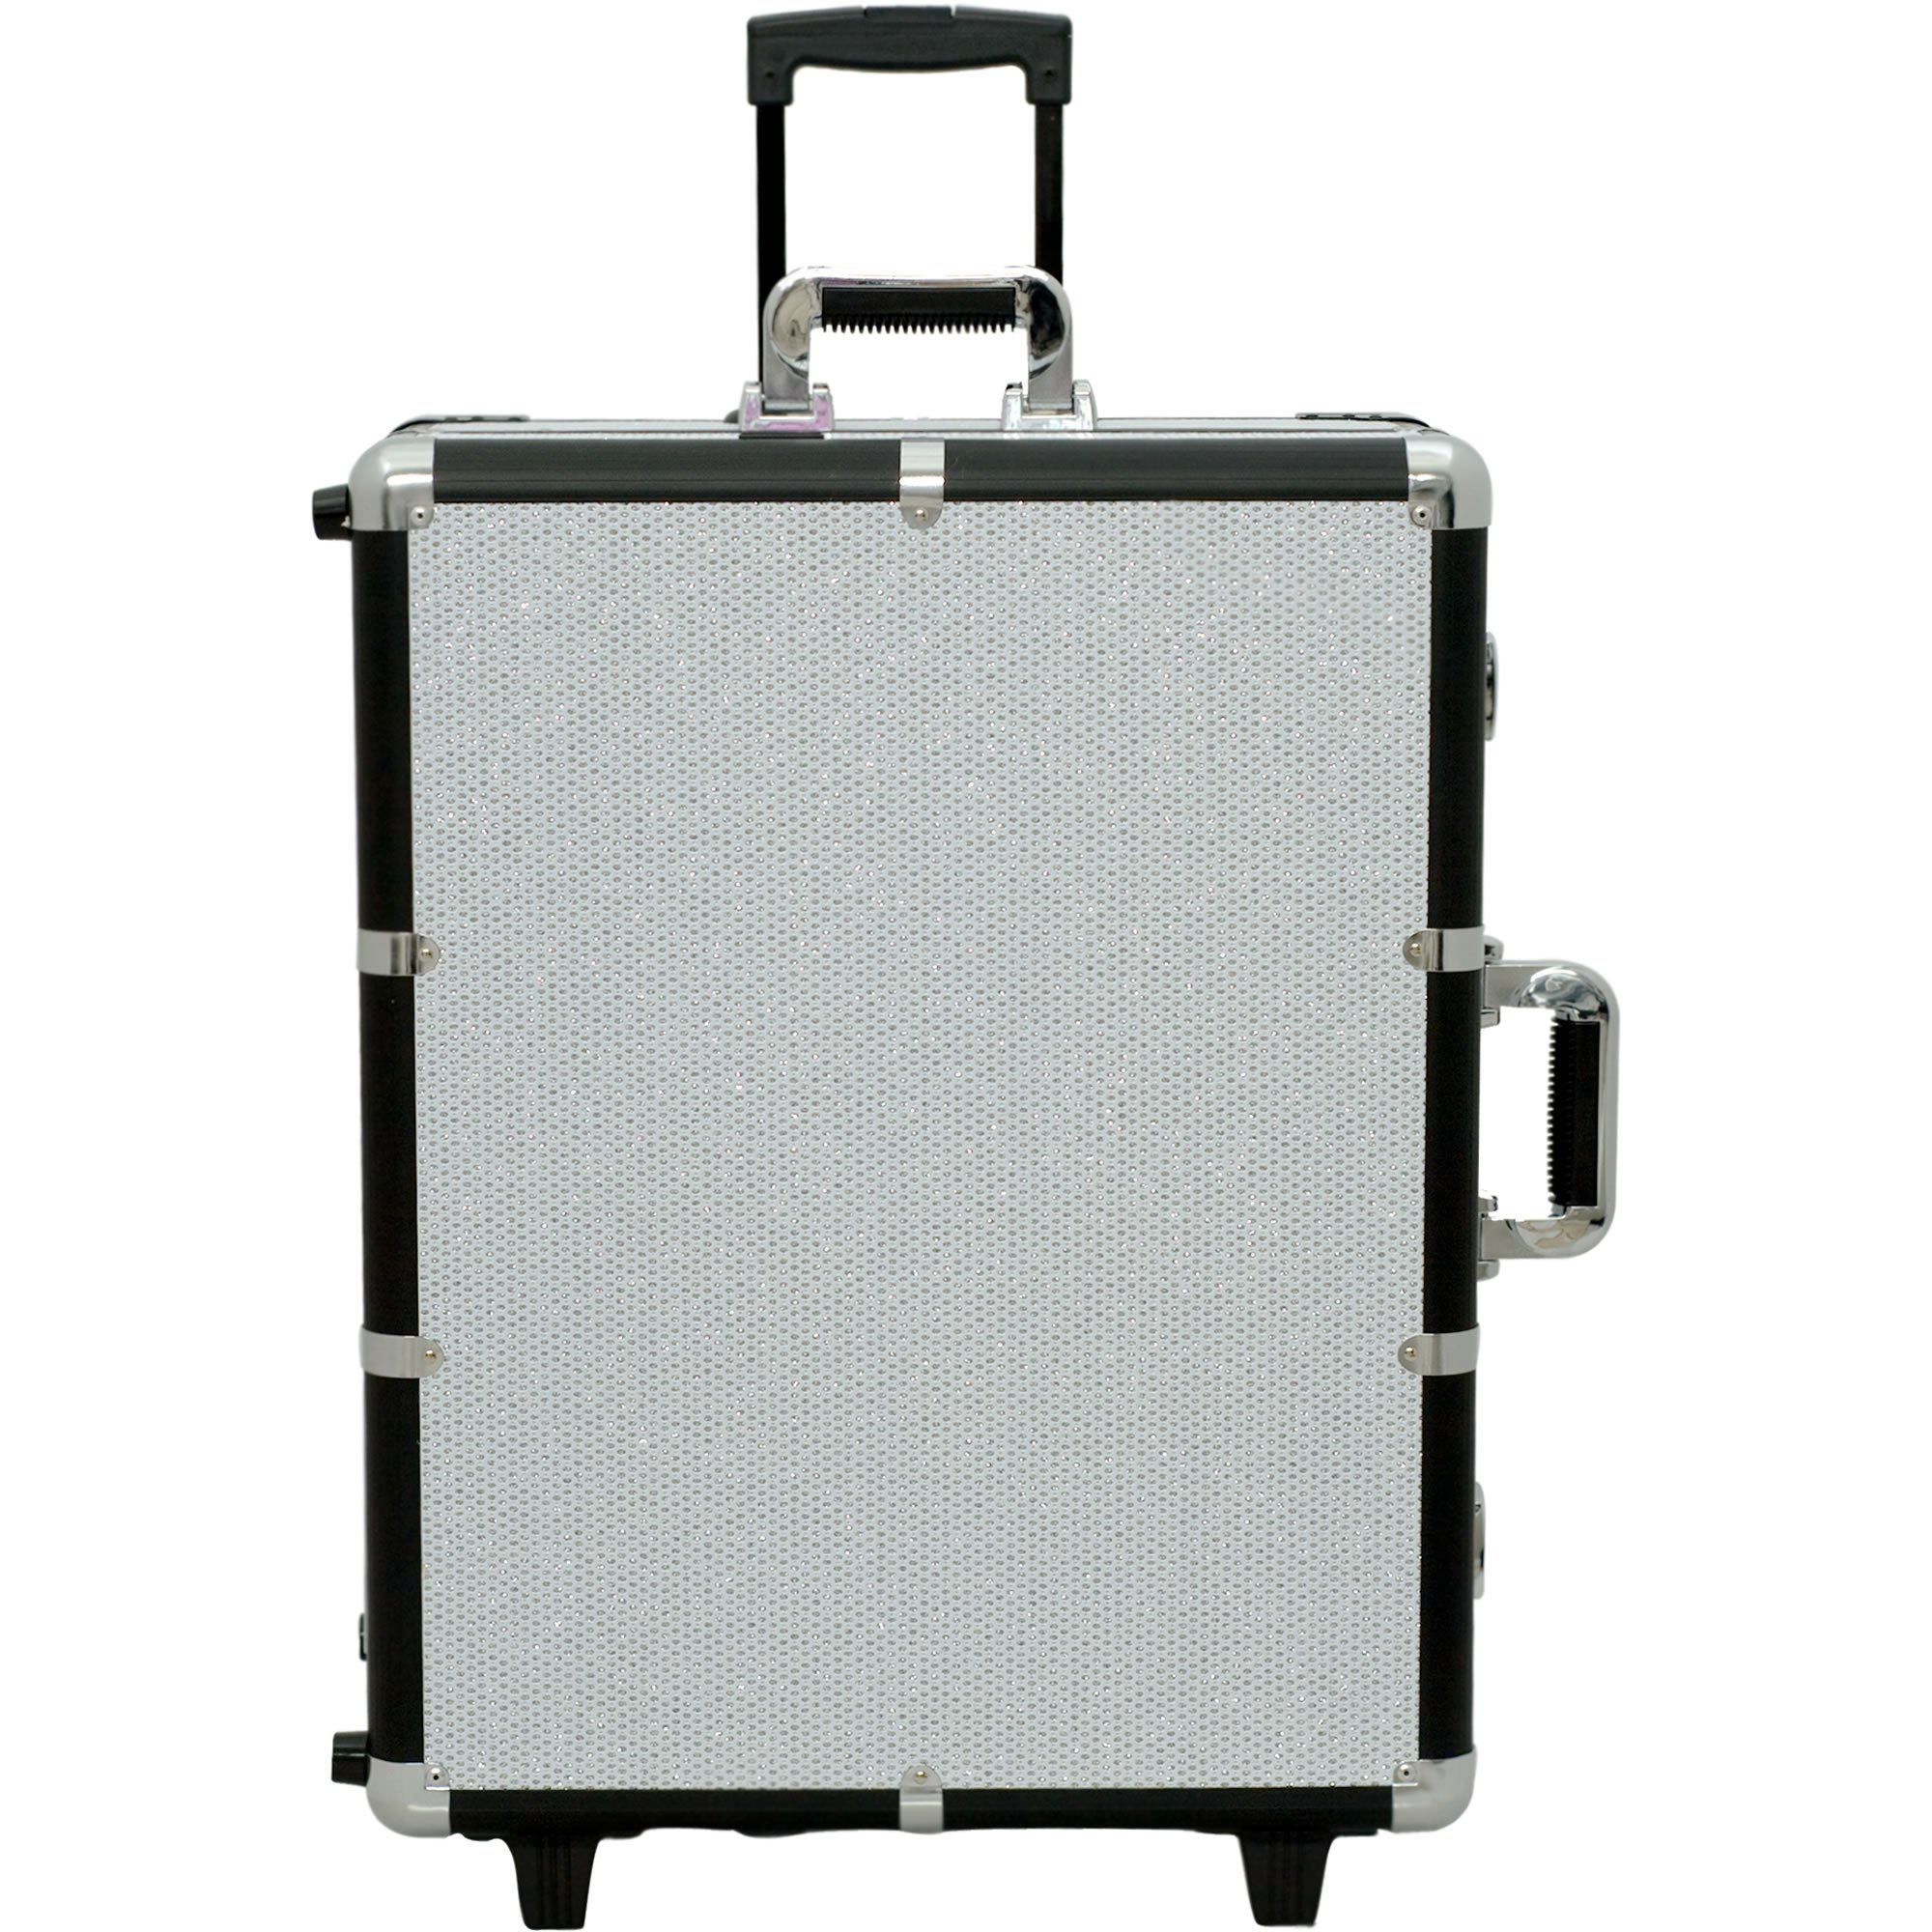 SUNRISE C6011 Lighted Makeup Case on Wheels Portable Studio, LED Bulbs, 4 Trays and 1 Brush Tray, Locking, White Krystal